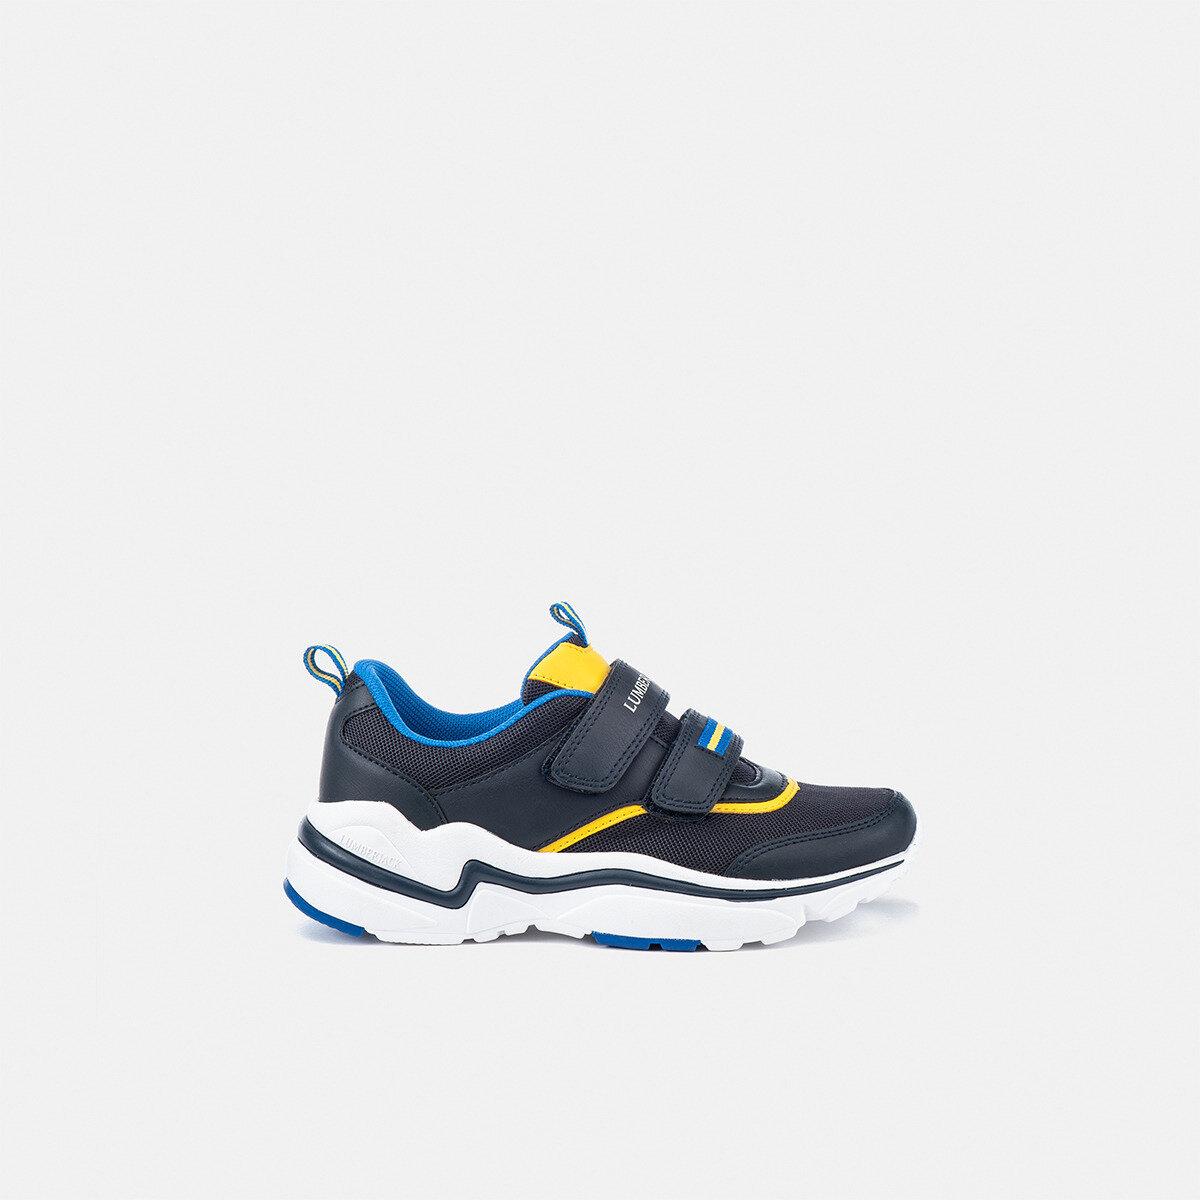 DREW NAVY BLUE/YELLOW Boy Sneakers